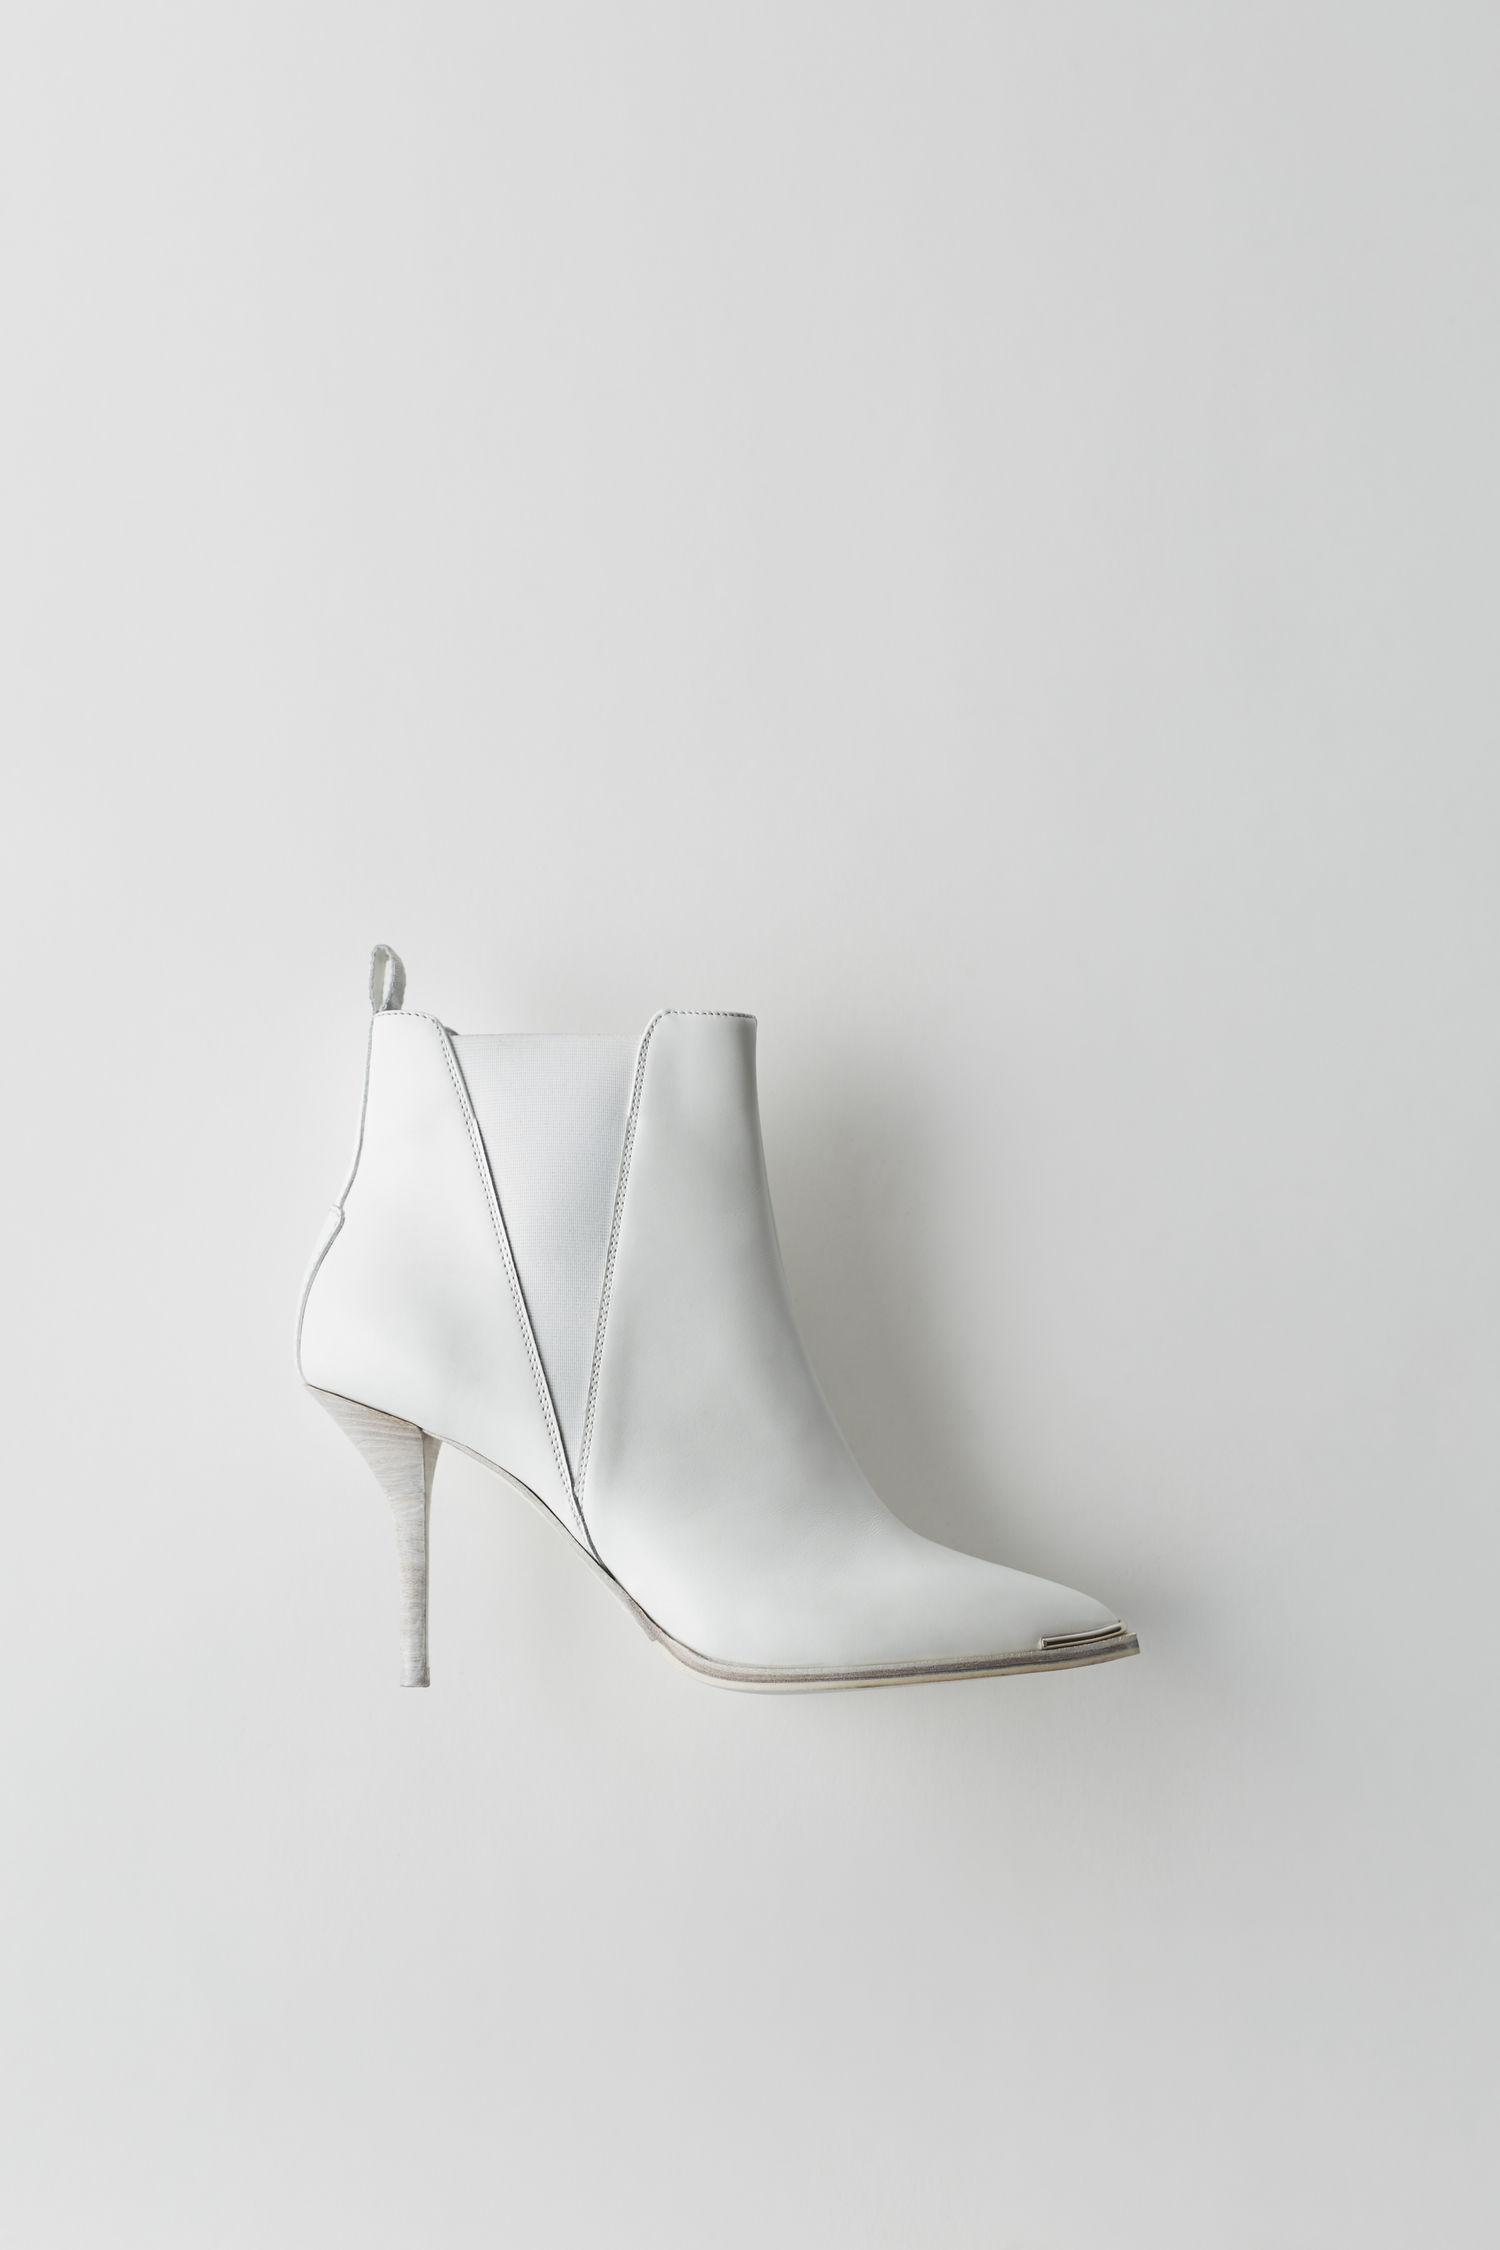 Acne Jemma Blanco/Blanco Stiletto Botas in Lyst Blanco Lyst in 3b9de2